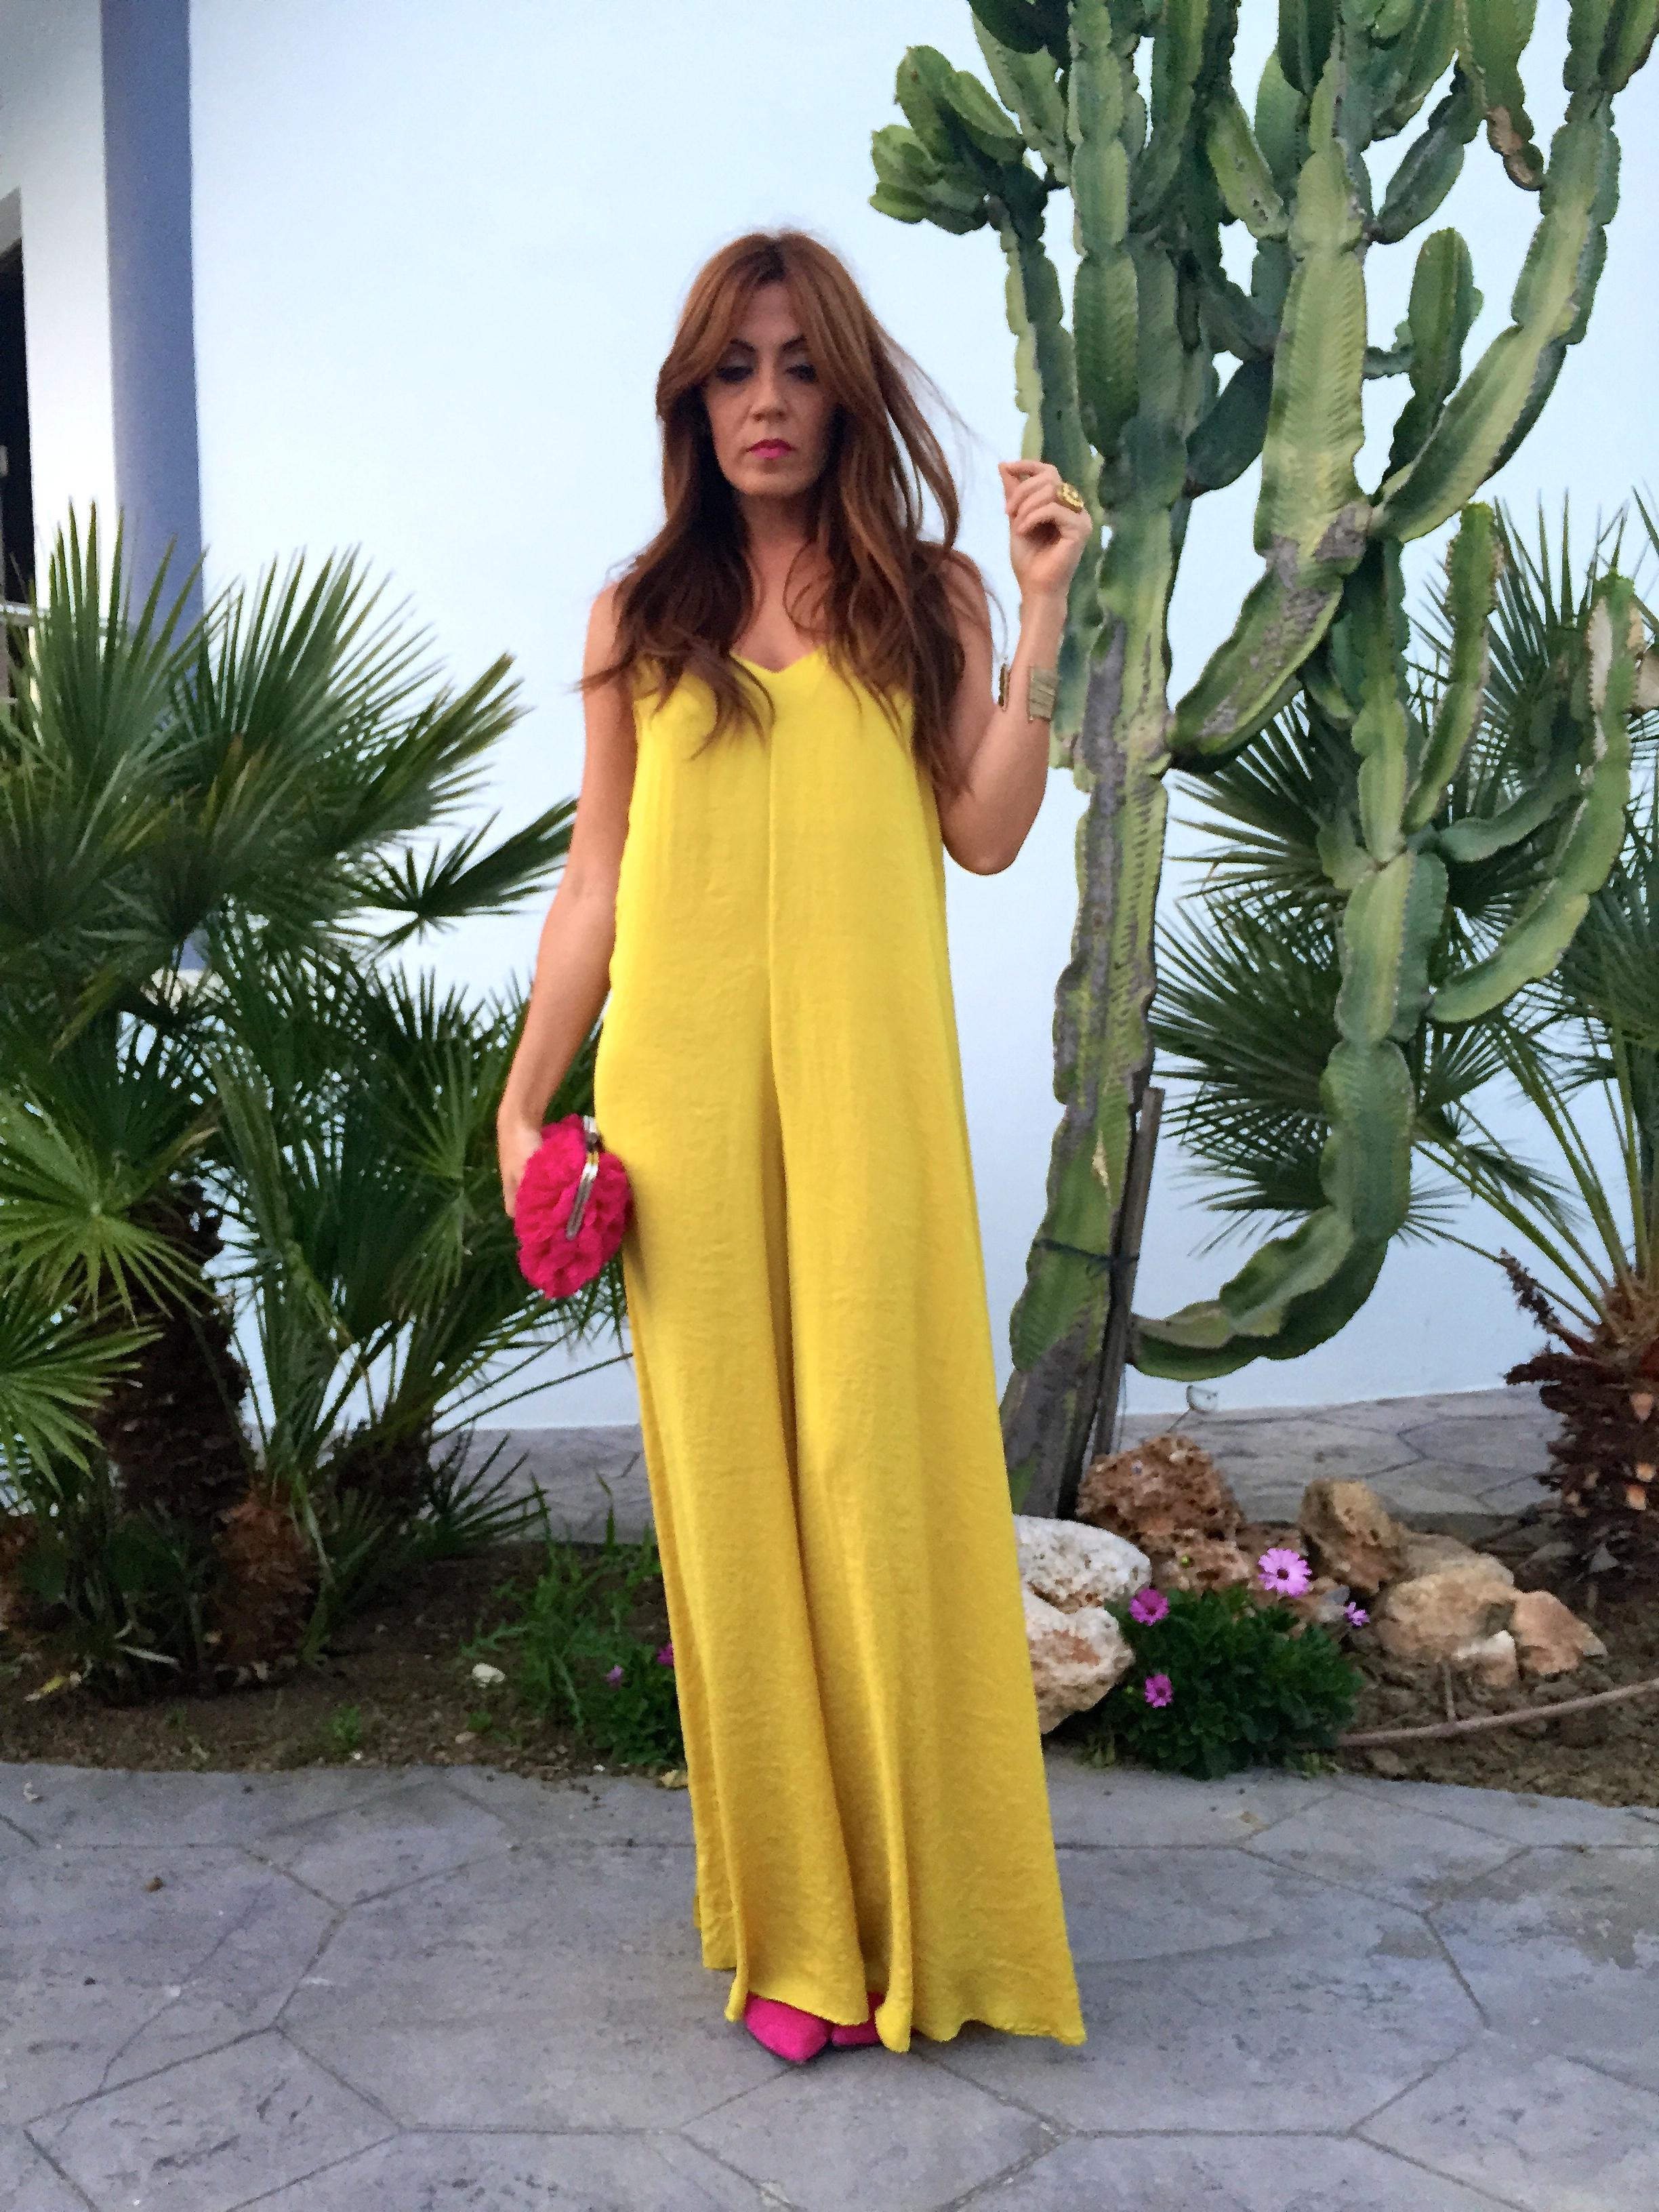 clientes primero 2019 original diseño popular Pantalon Palazzo | Jessica Sánchez | Personal Shopper